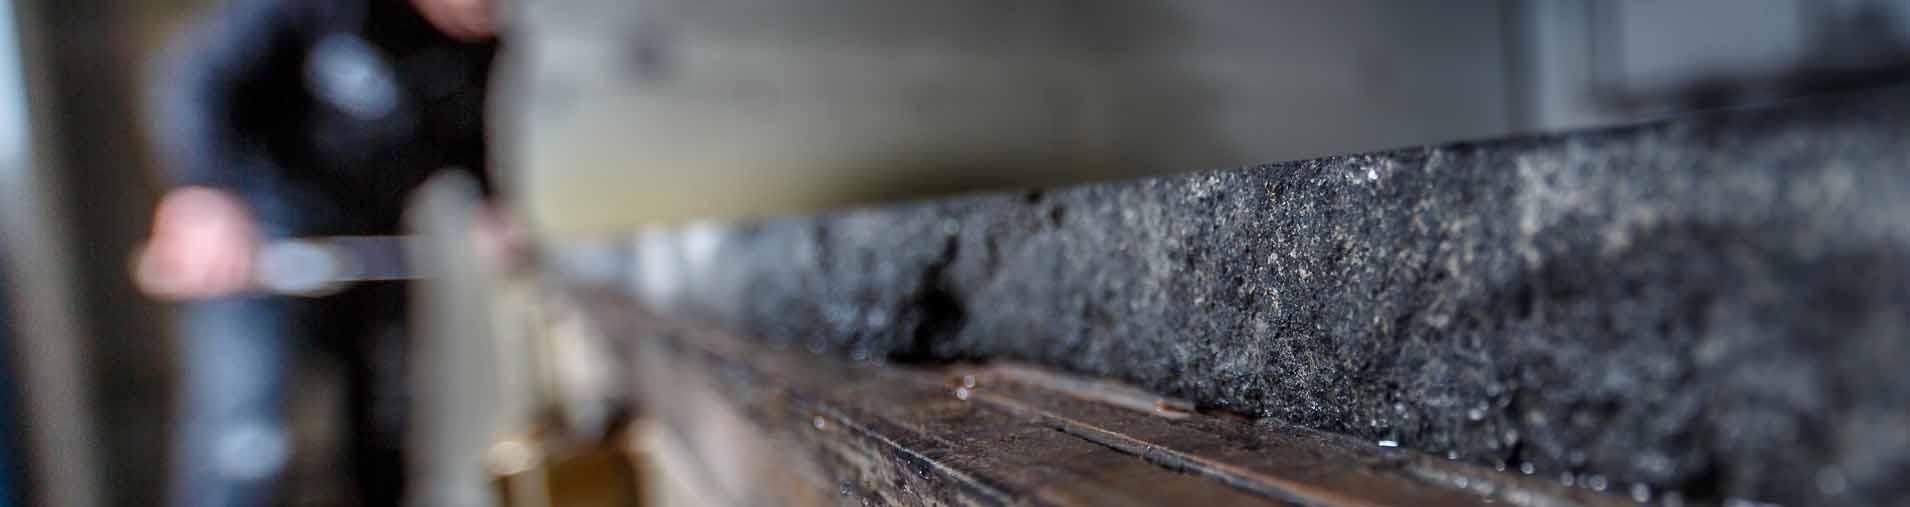 naturstein aus wesseling bei k ln maas gmbh. Black Bedroom Furniture Sets. Home Design Ideas